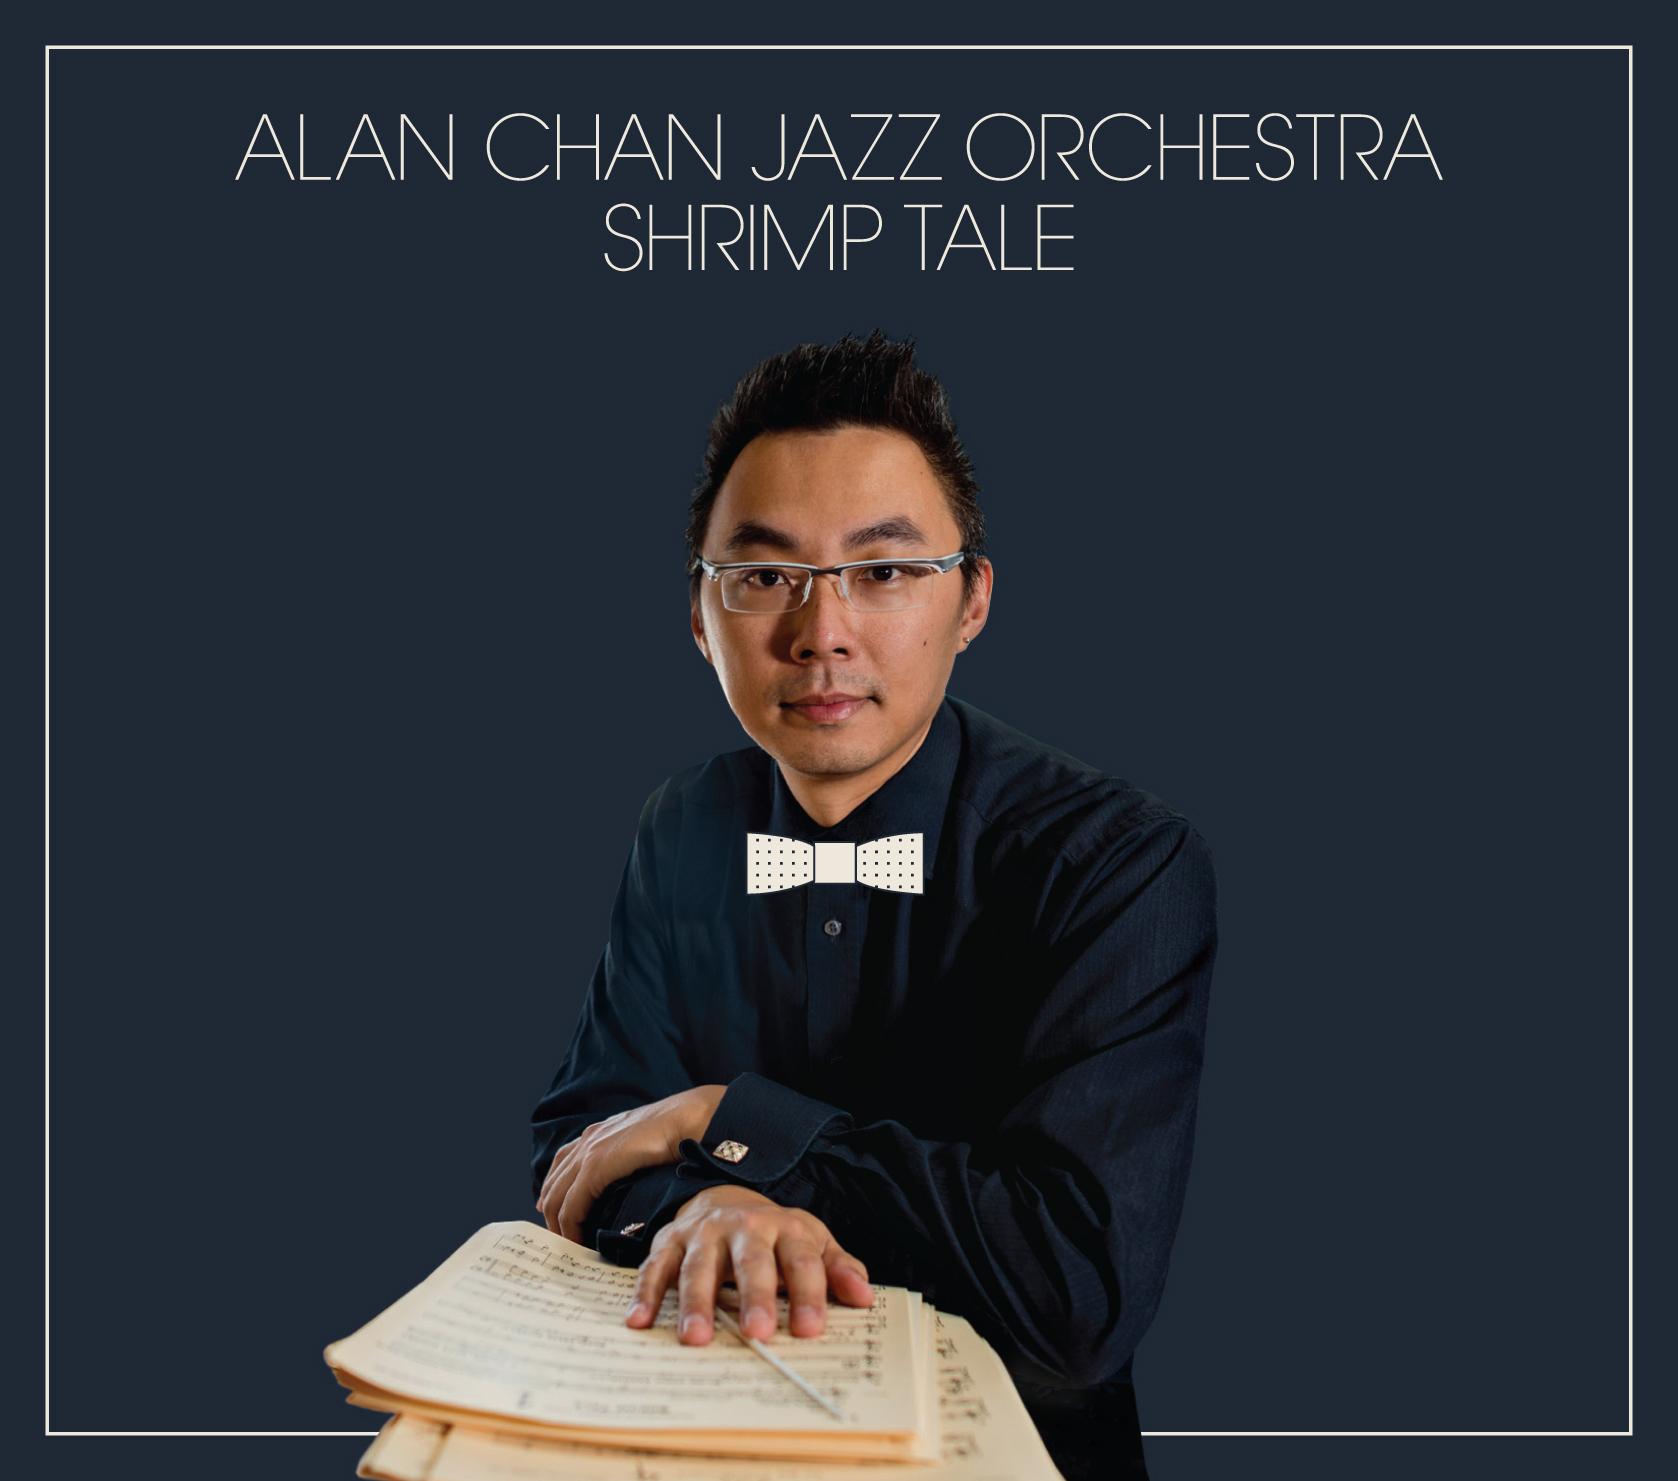 Shrimp Tale (2014) cover